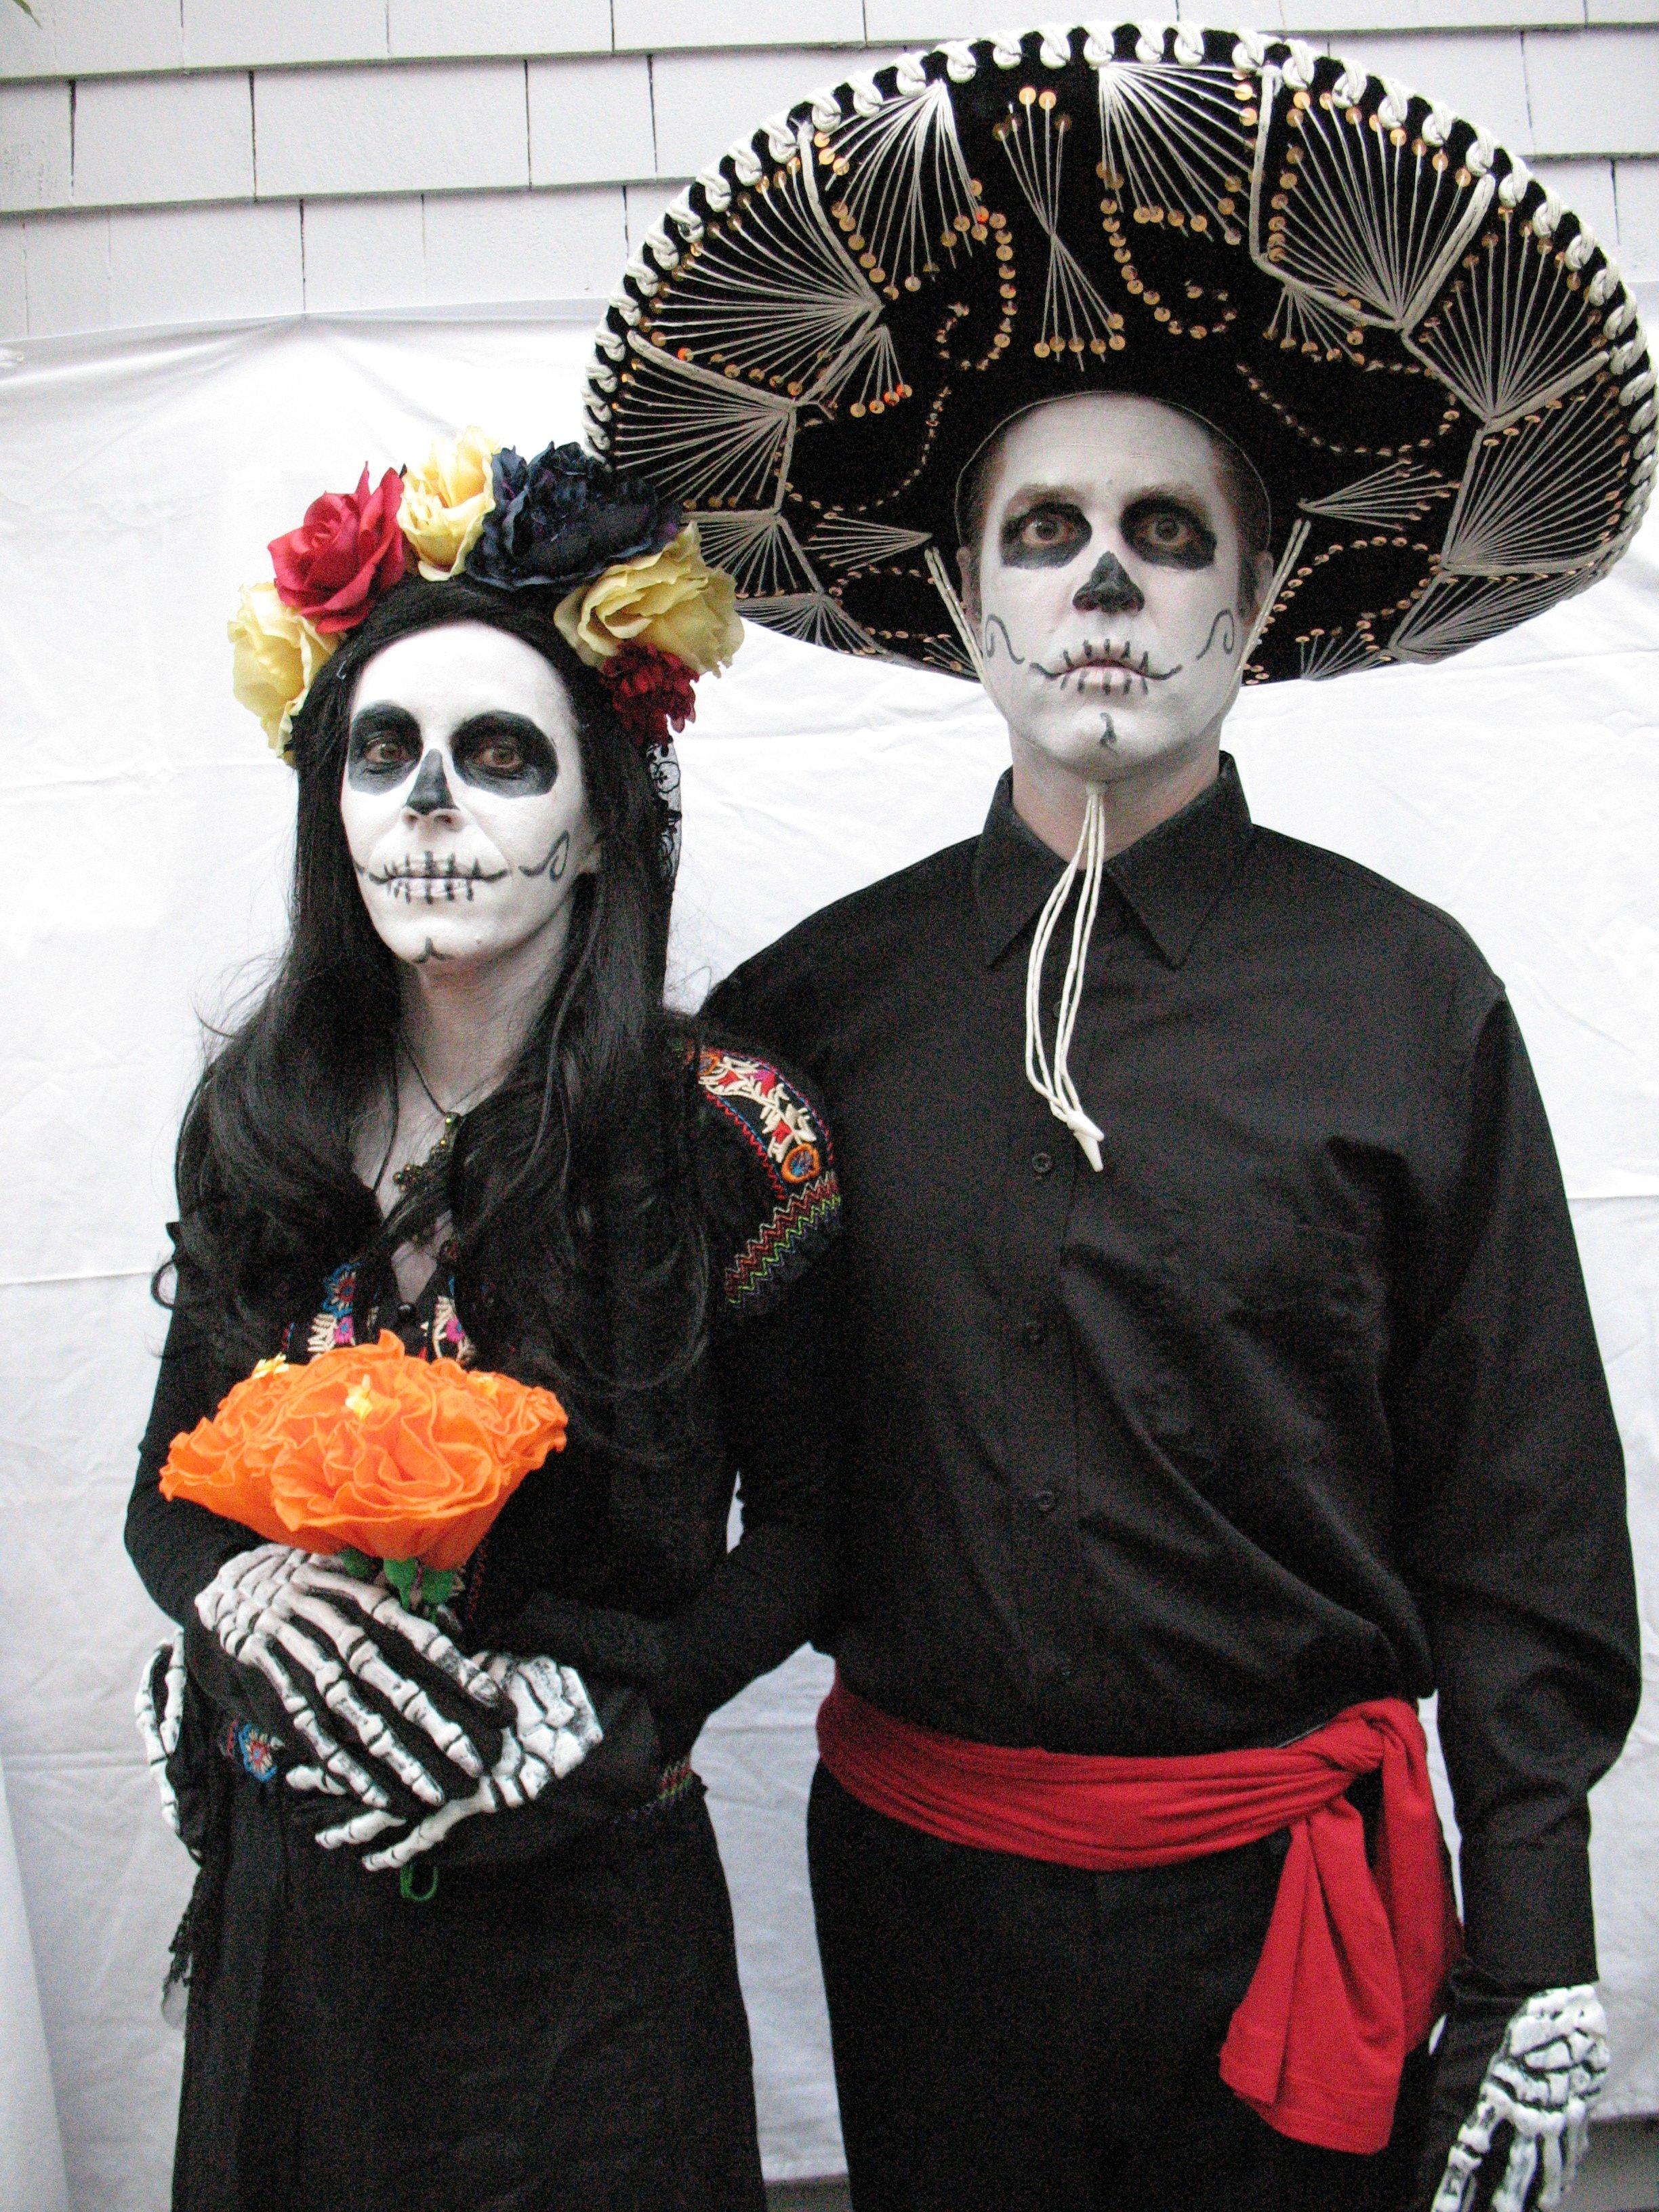 10 Best Dia De Los Muertos Costume Ideas day of the dead costumes dia de los muertos all hallows eve 5 2020